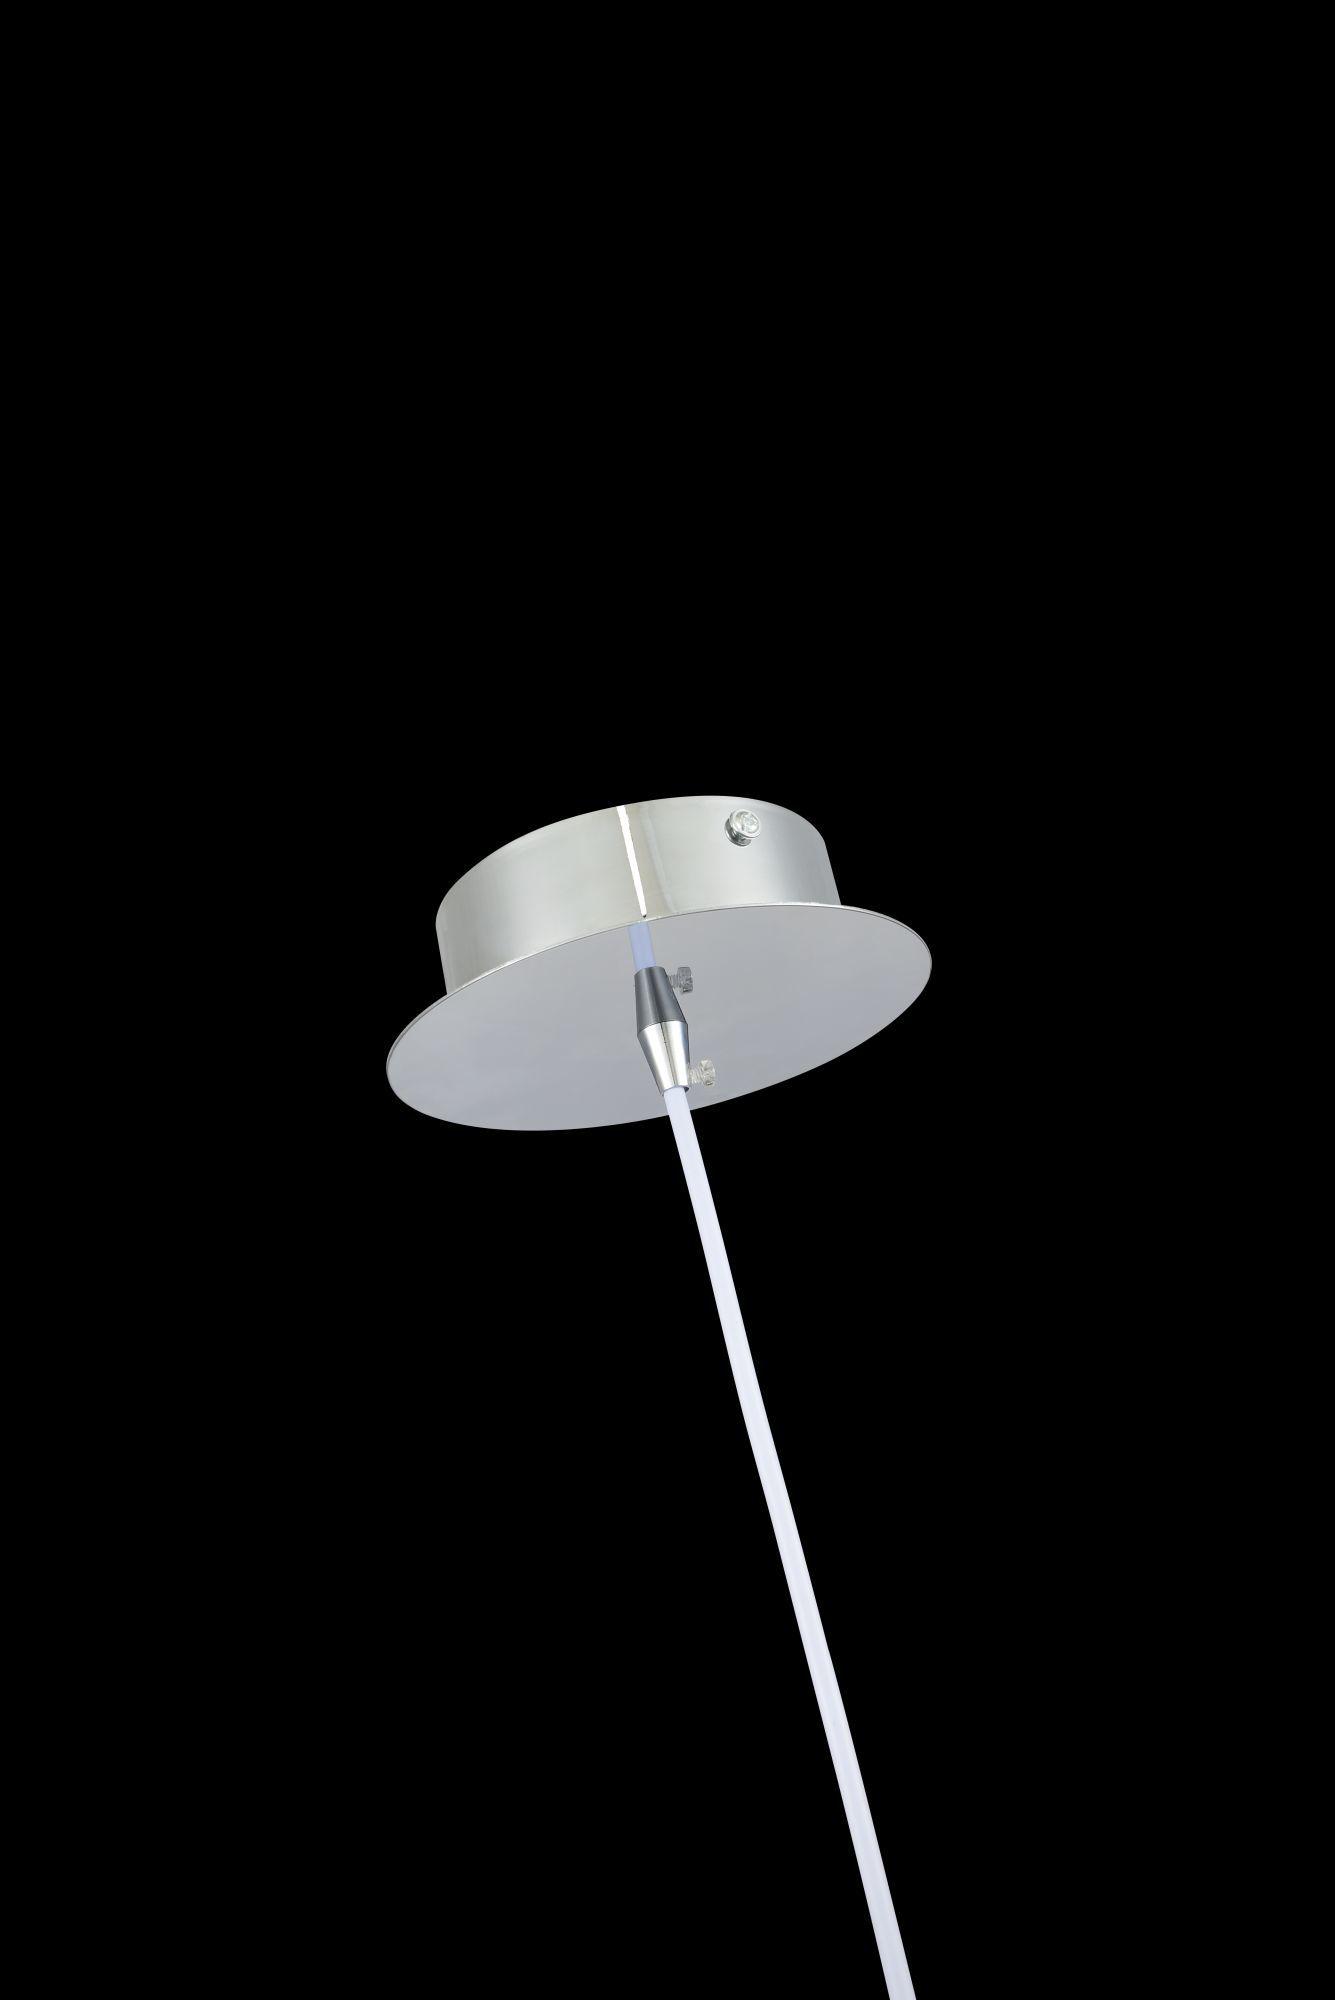 Подвесной светильник Maytoni Modern Dewdrop P225-PL-300-N (MOD225-30-N), 1xE27x8W, белый, металл, стекло - фото 4